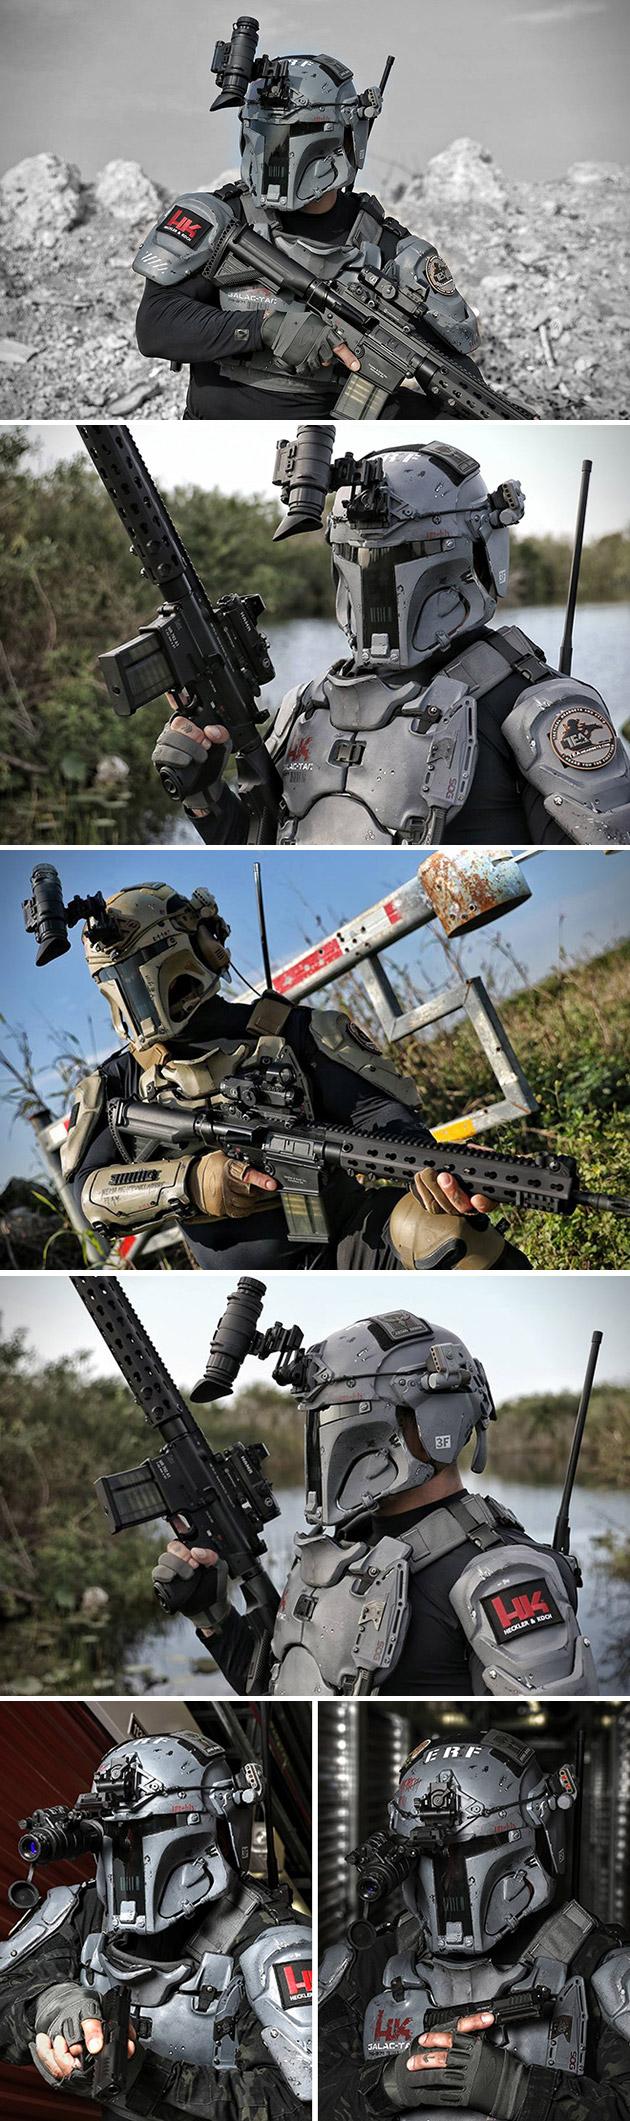 Boba Fett Armor